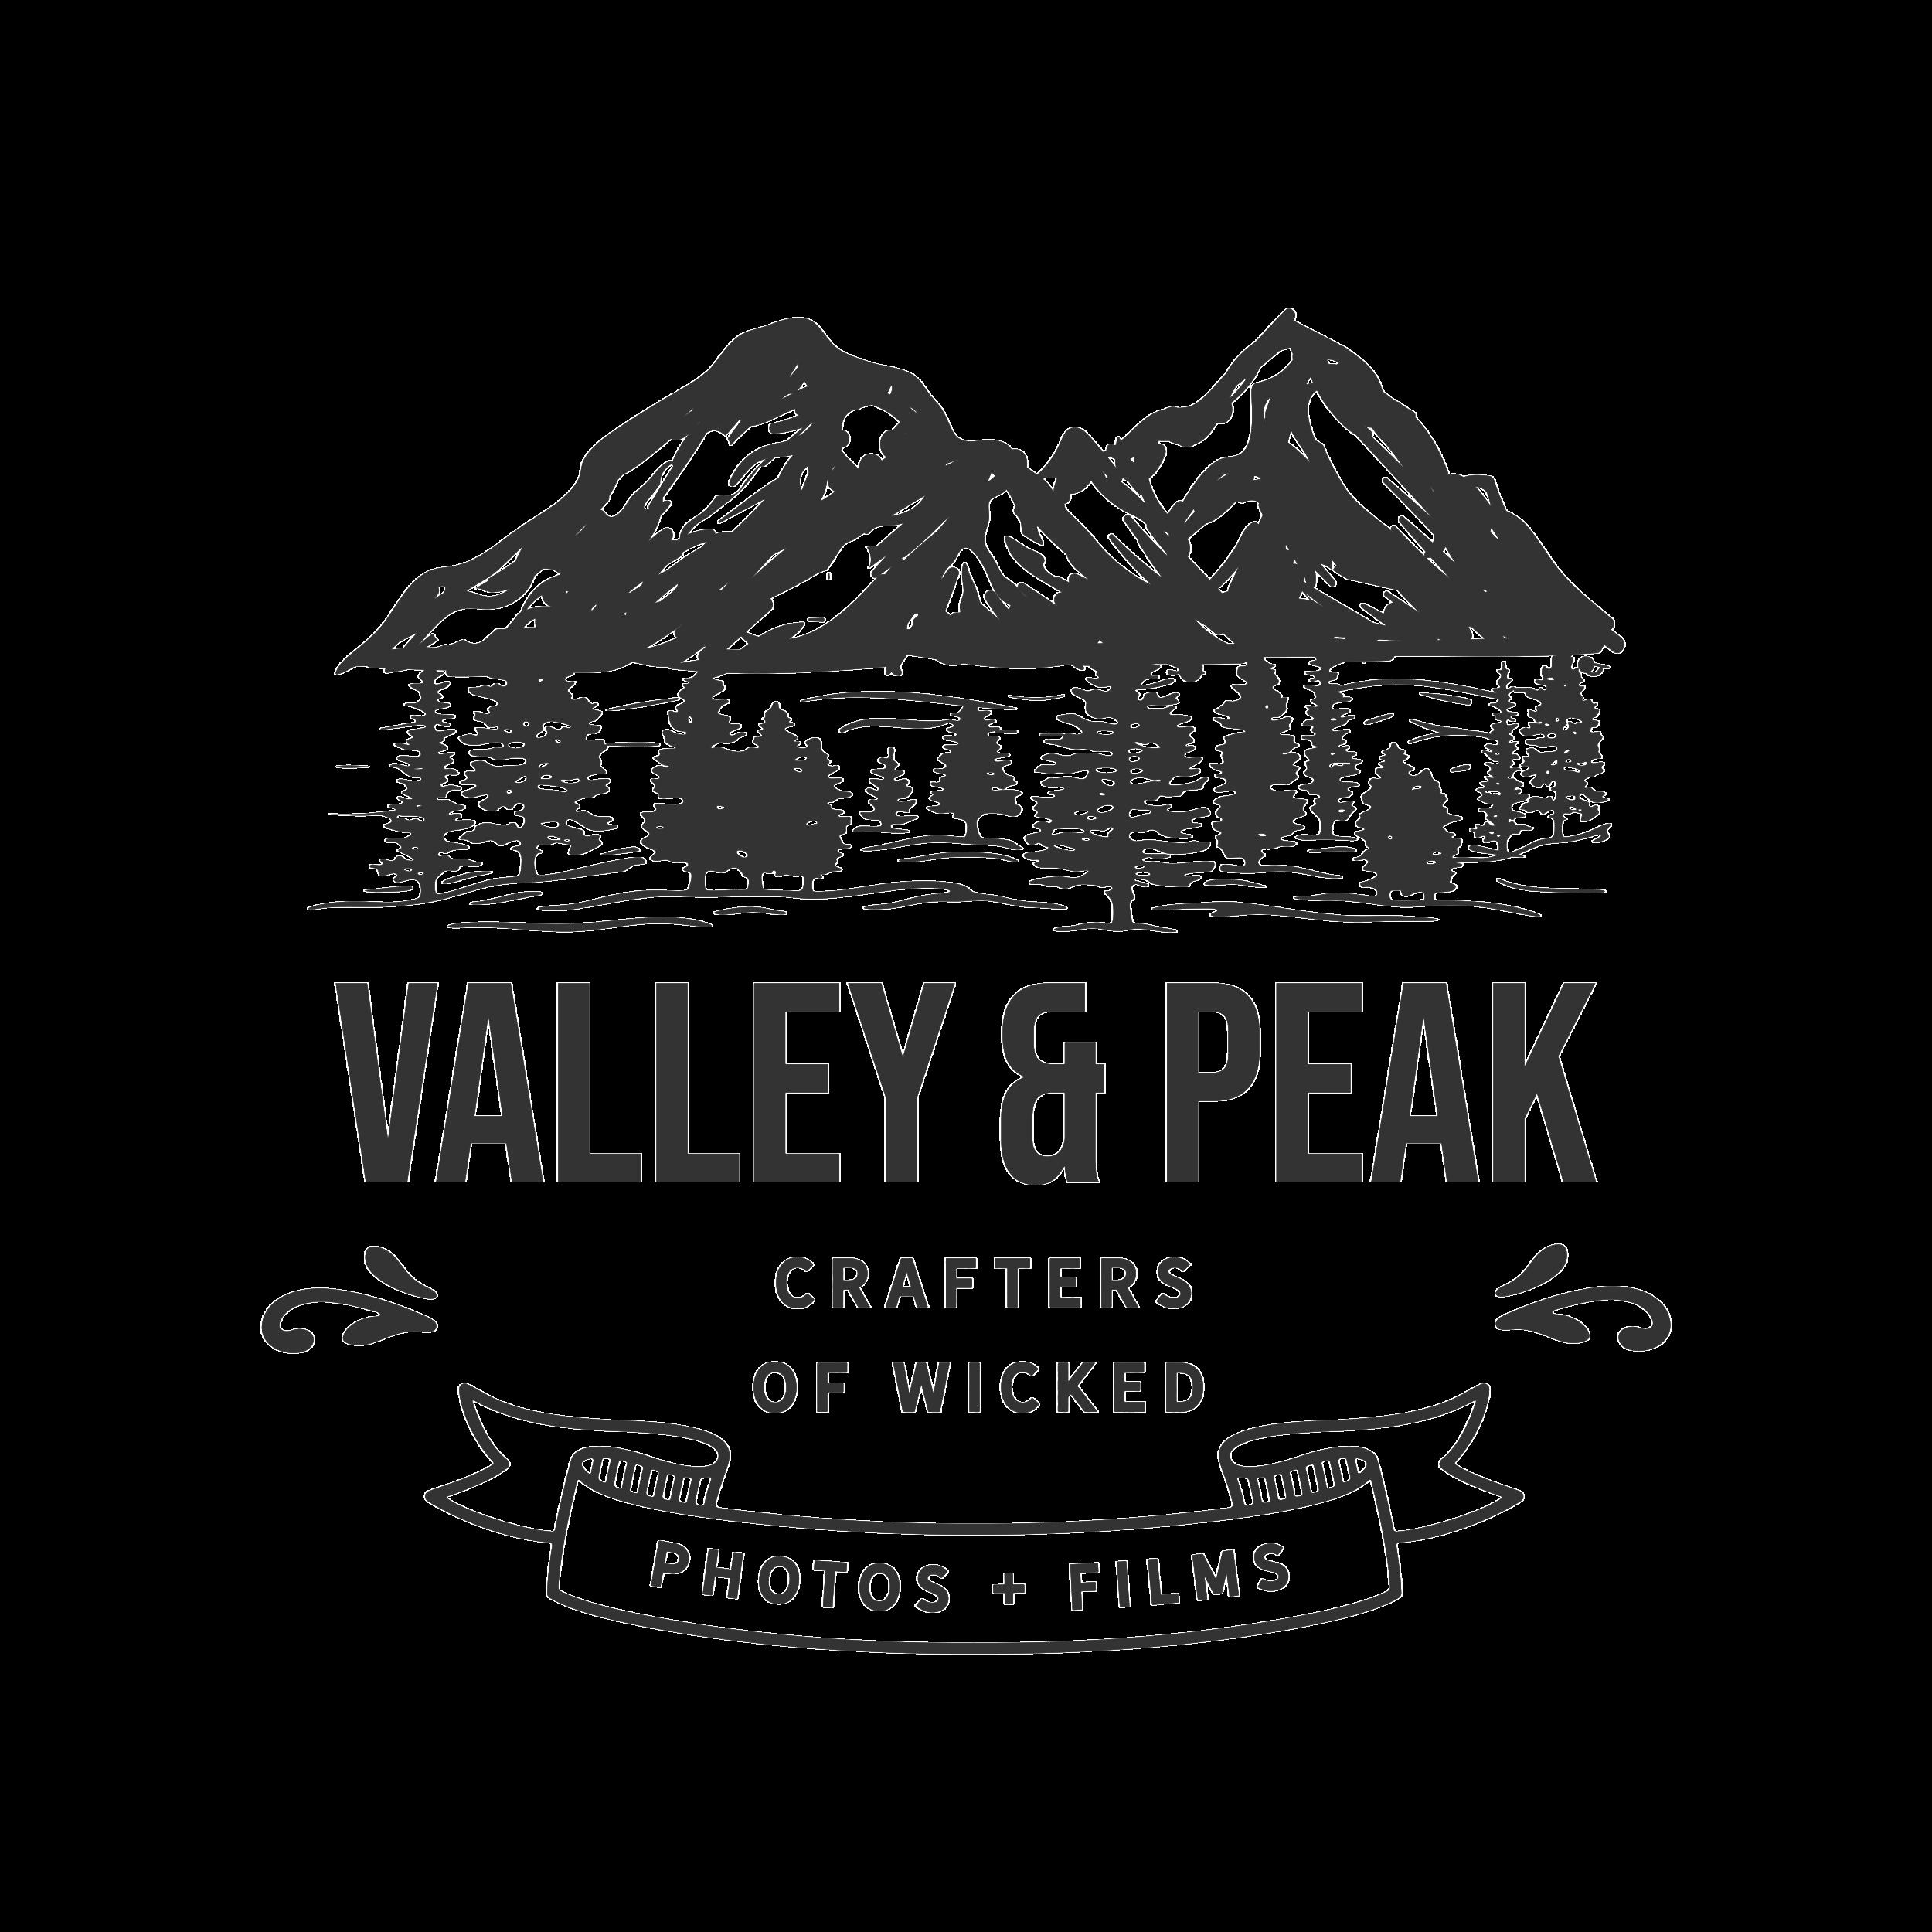 Valley Loves Valley & Peak 2